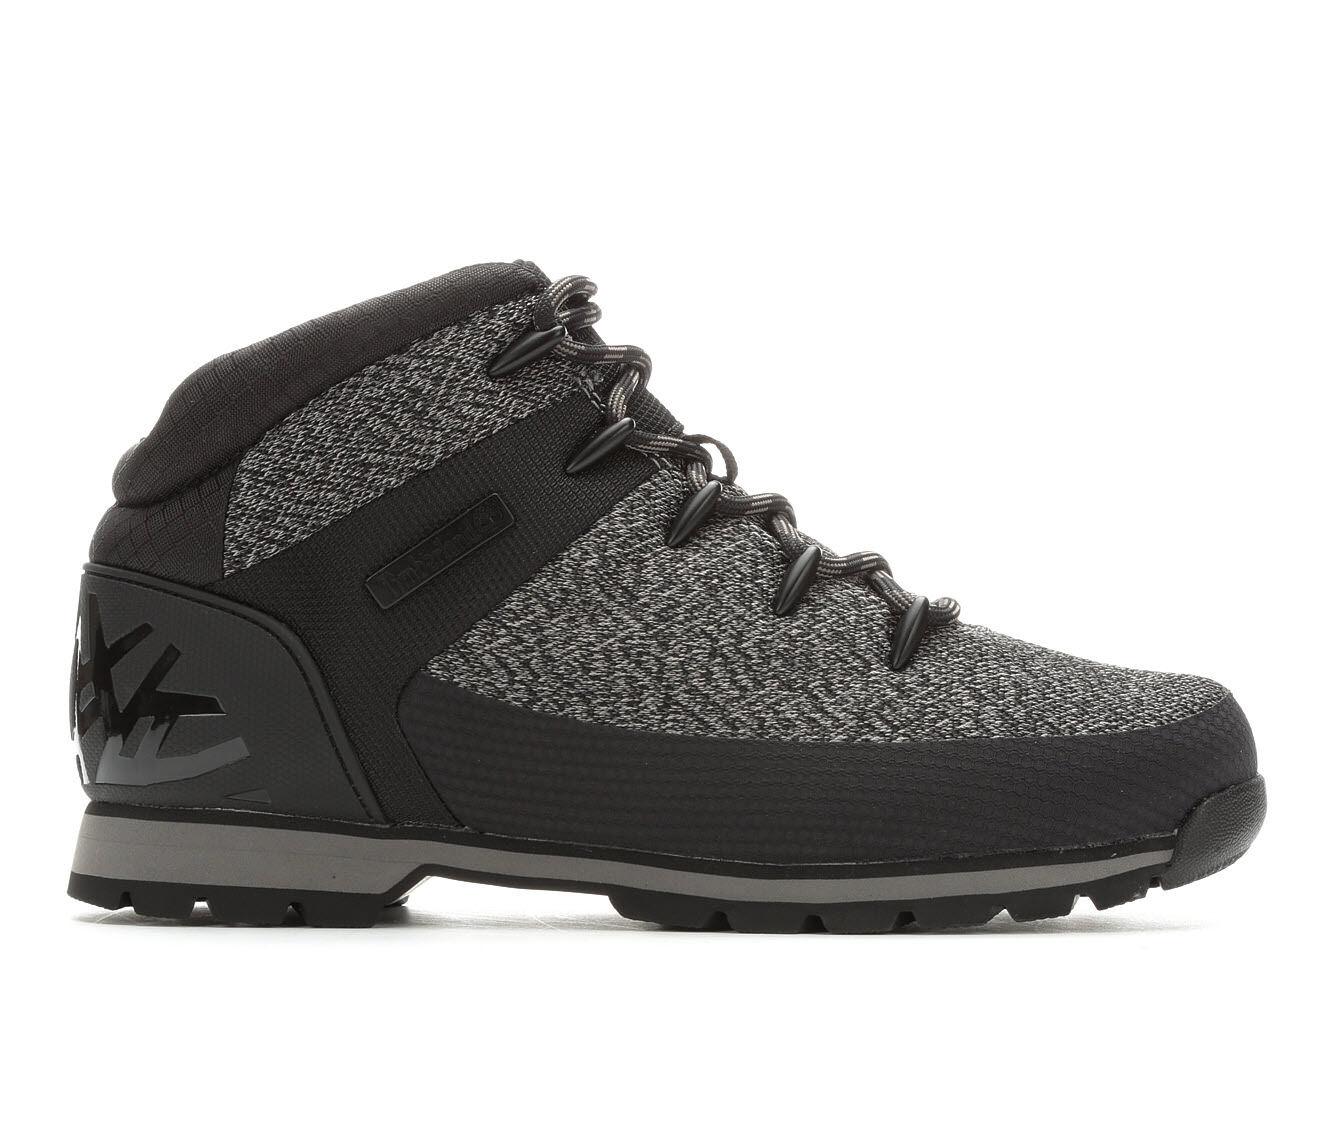 Men's Timberland Euro Sprint Hiker Boots Black/Grey